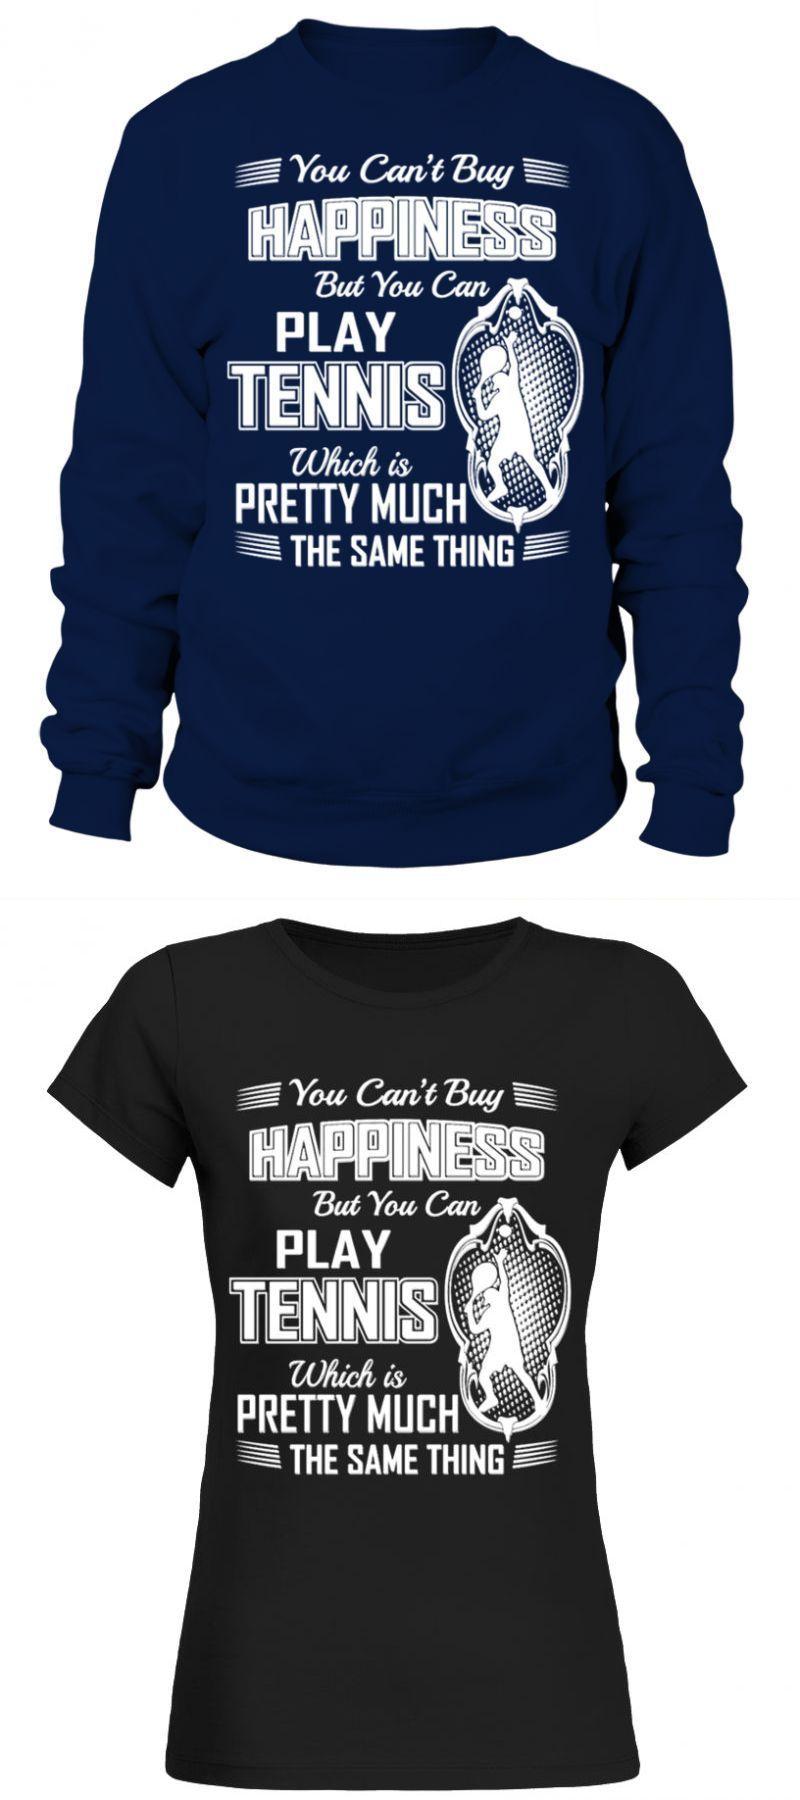 56e1492db81 Tennis ball racket ace sports team player mom dad tenis t shirt #tennis  #ball #racket #ace #sports #team #player #mom #dad #tenis #shirt #london  #sweatshirt ...